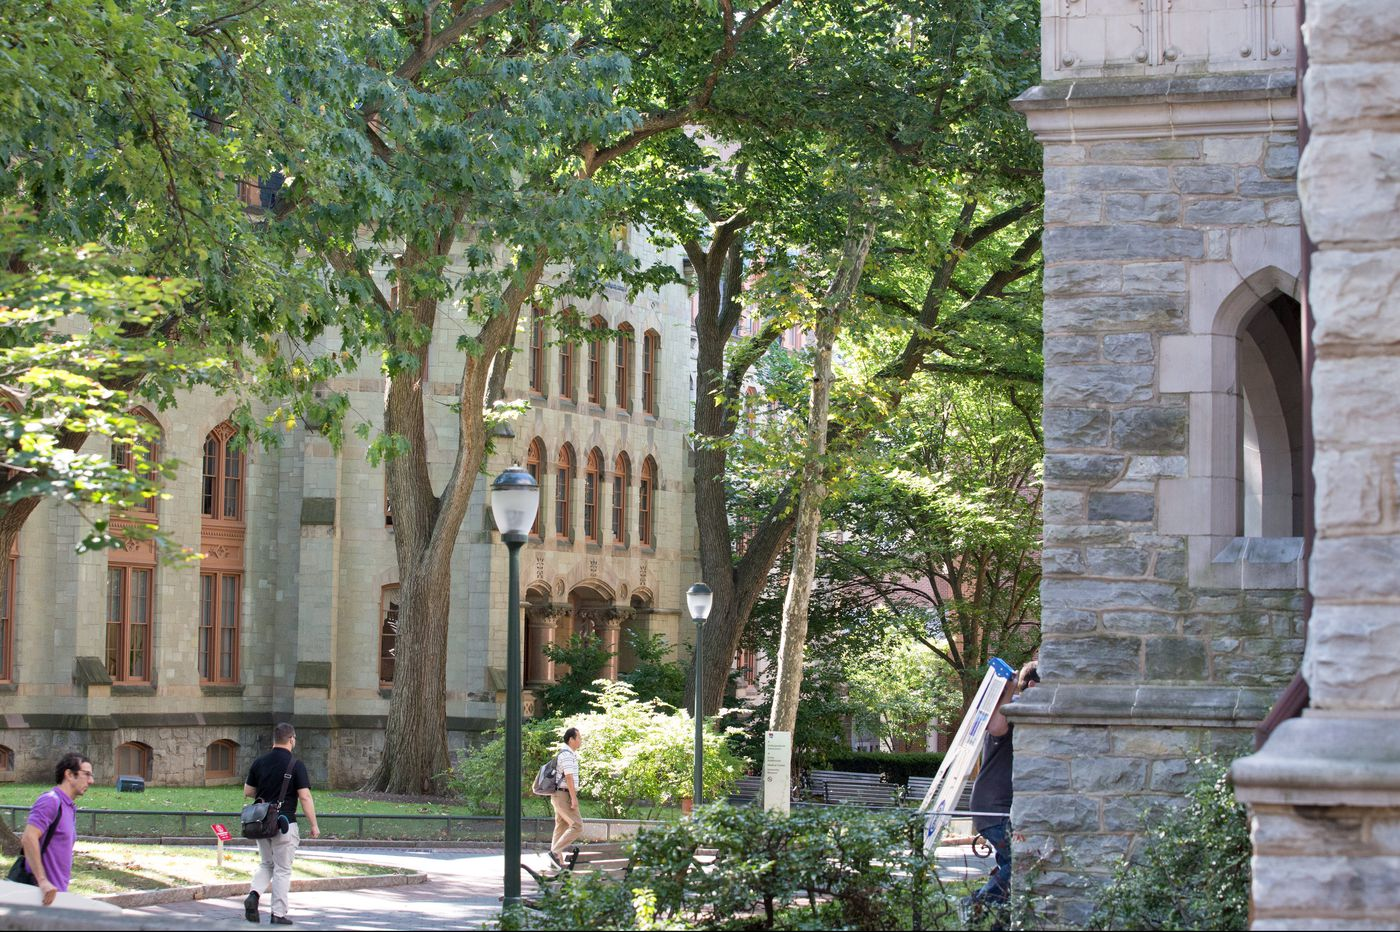 Penn, West Chester join program to develop more STEM teachers